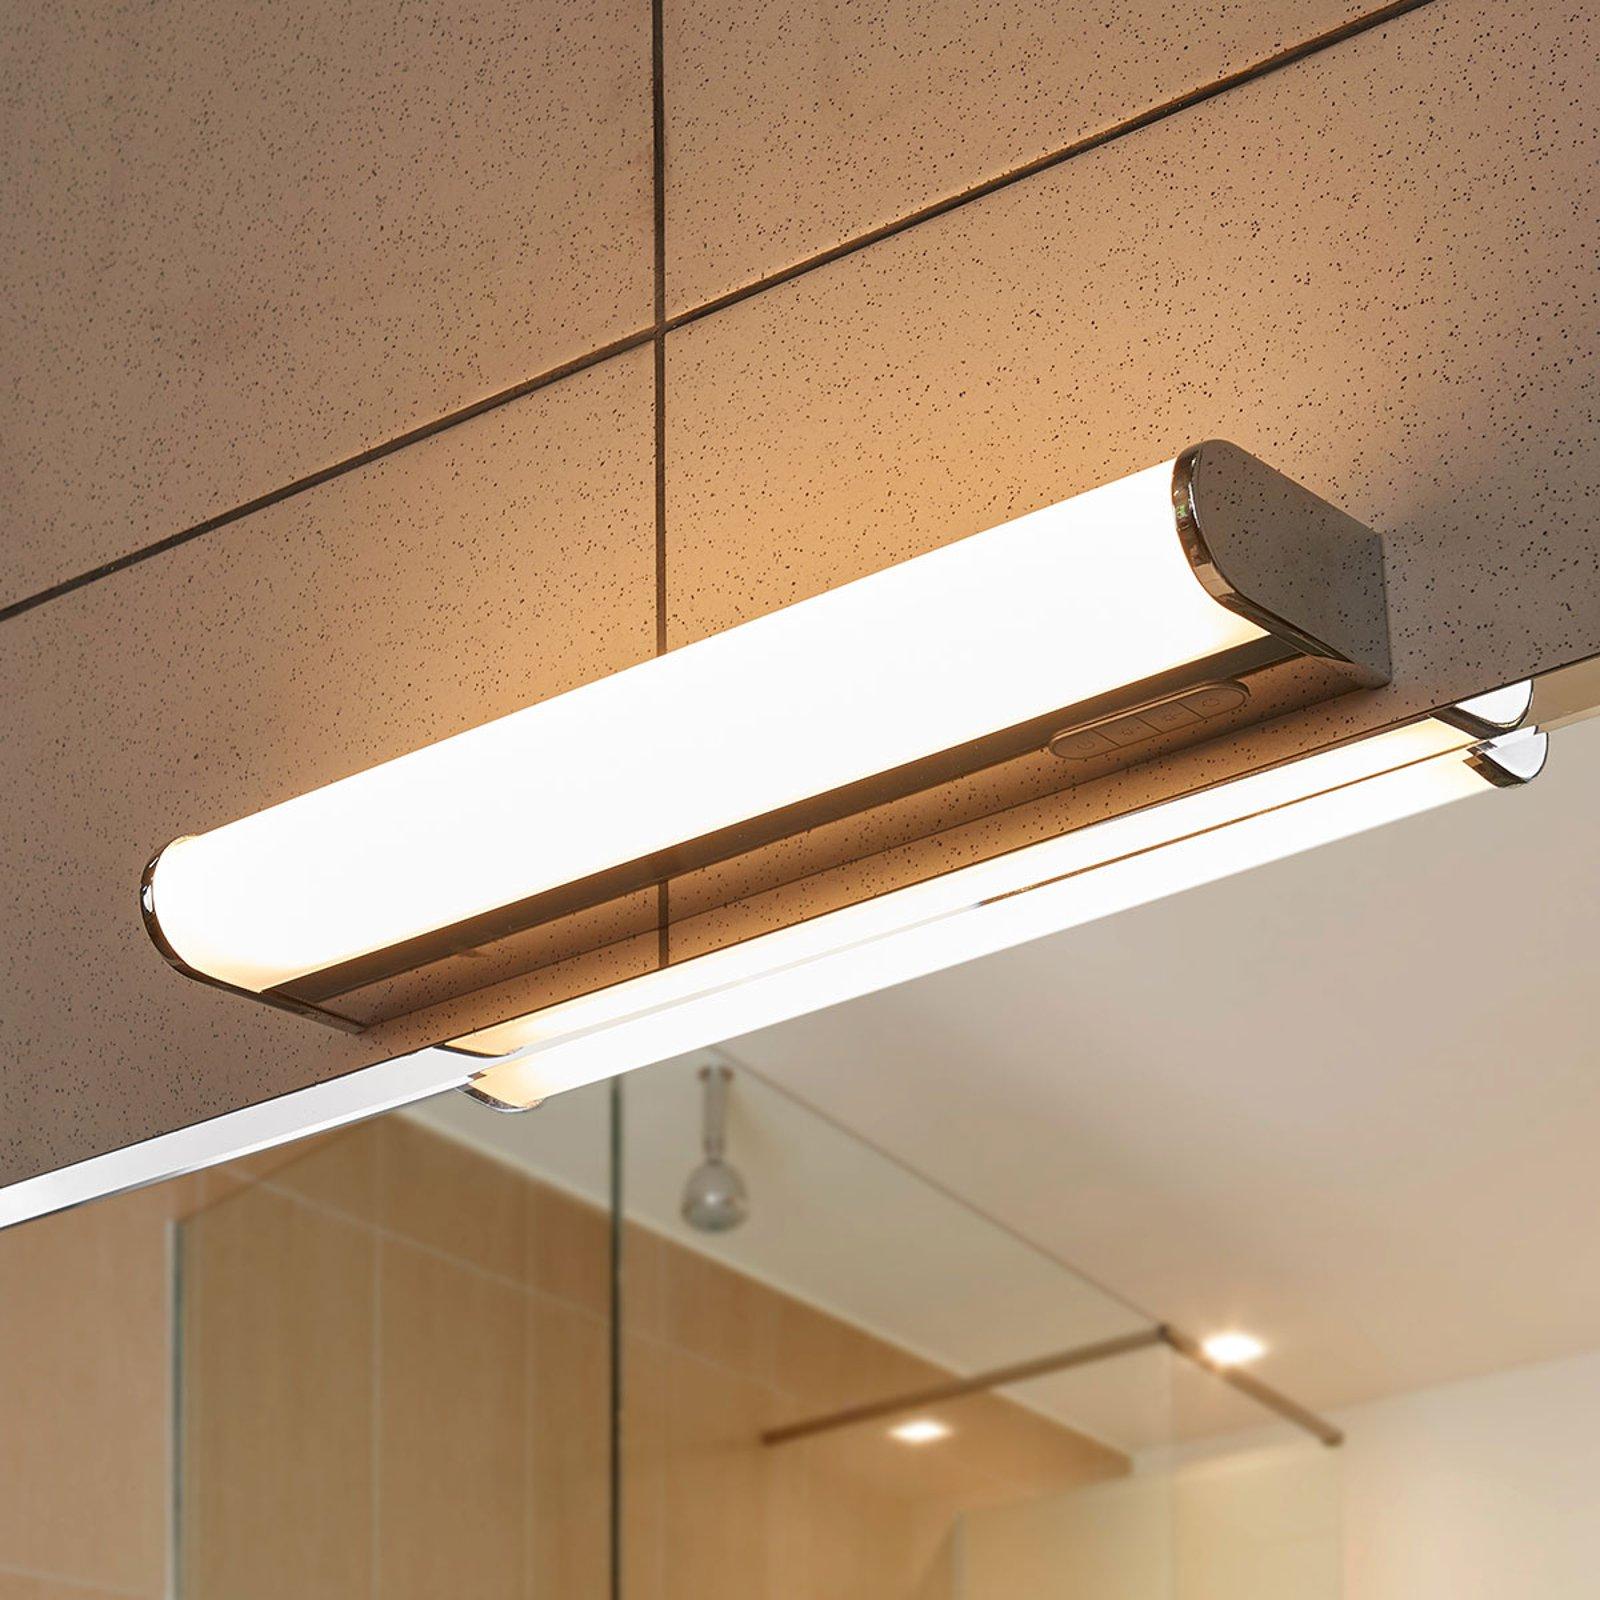 LED-vegglampe Jesko bad 3 000-6 500K, 33cm